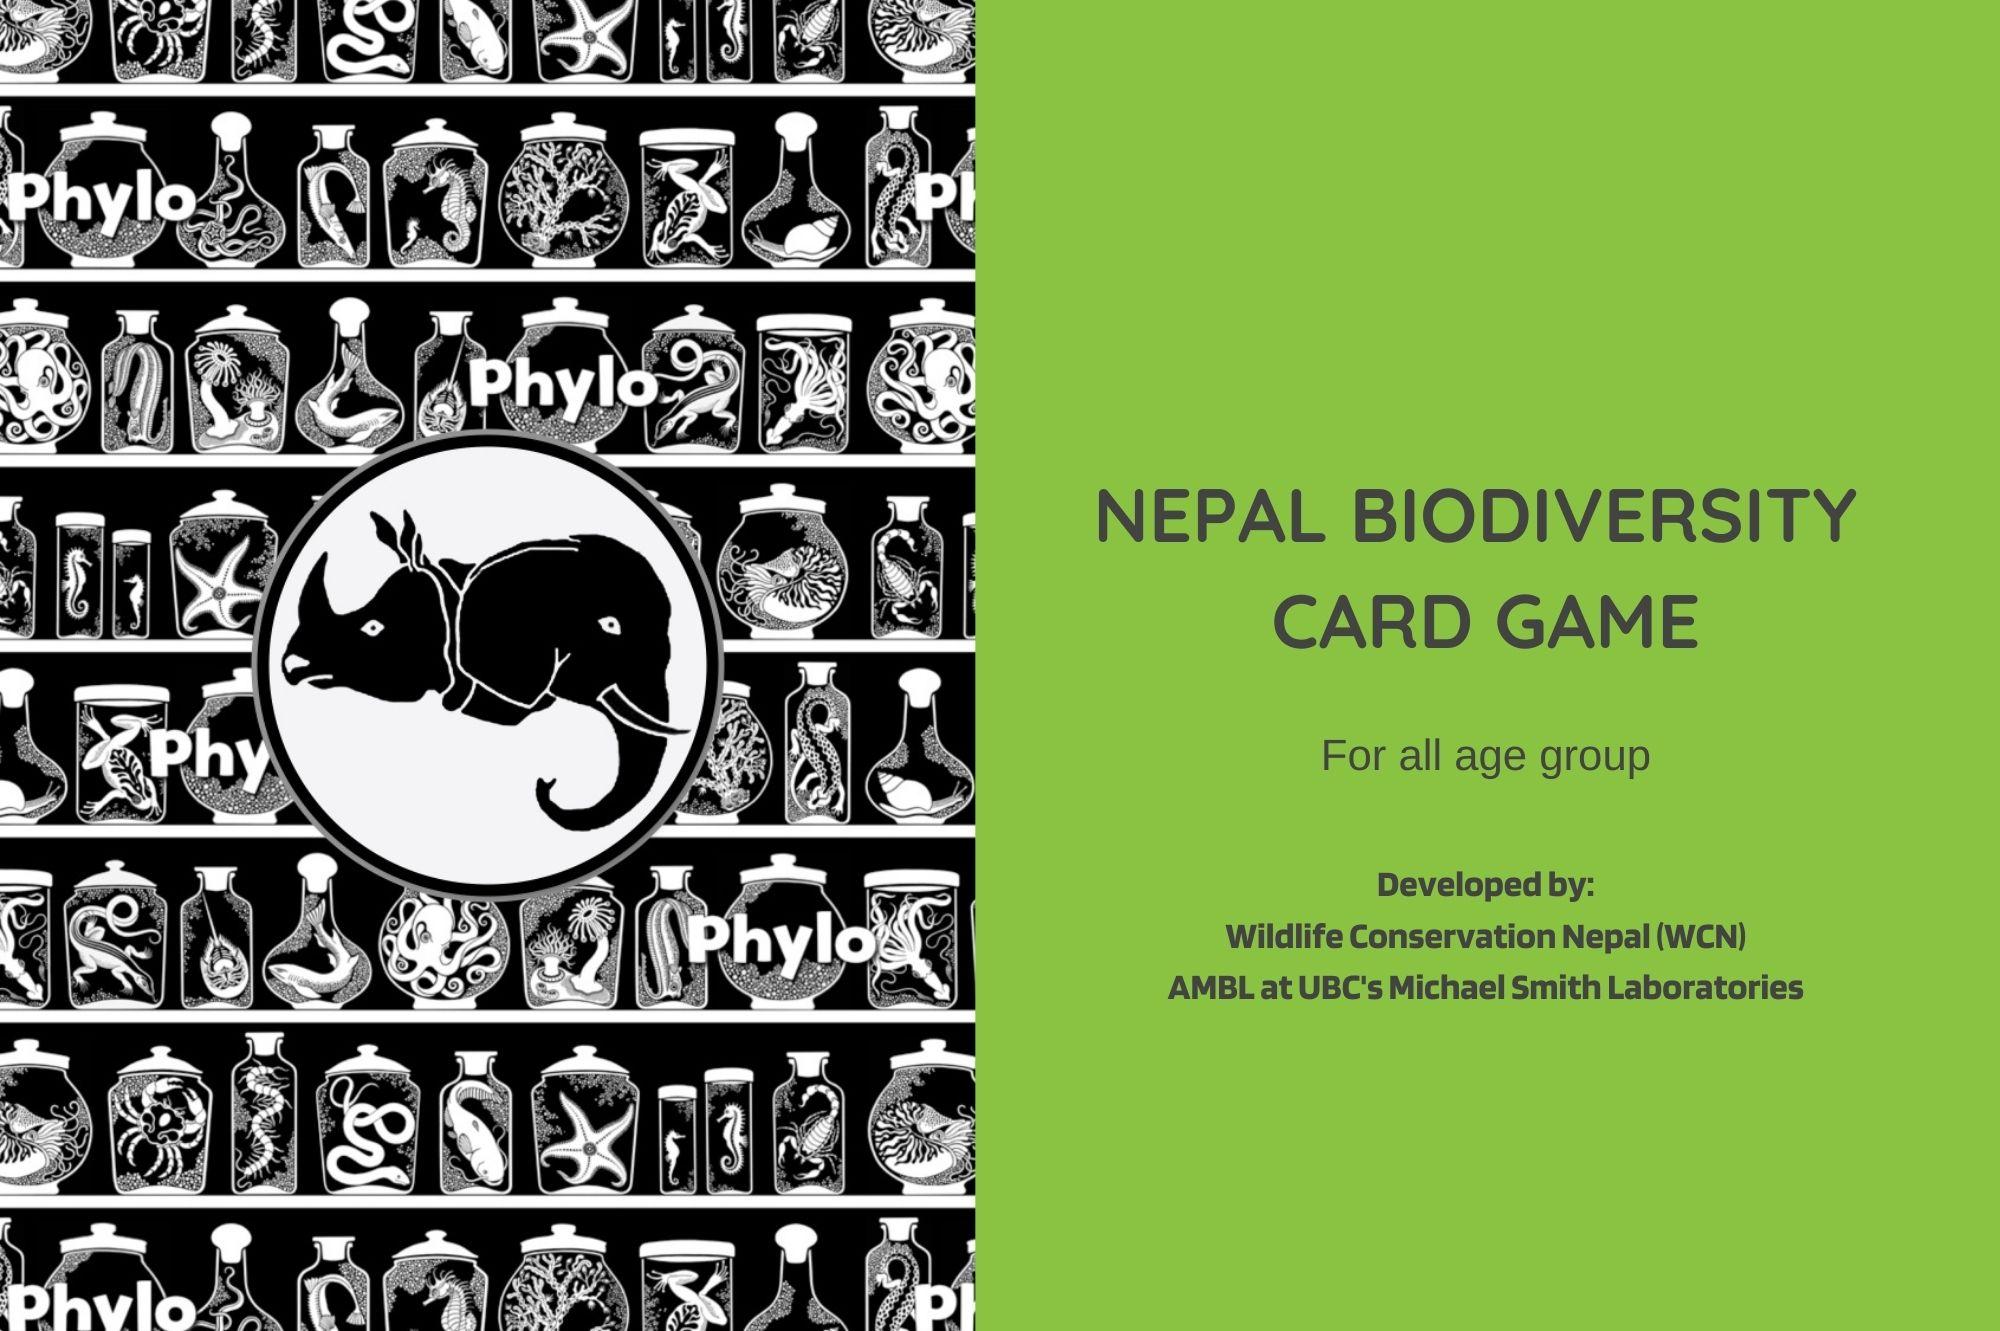 Nepal Biodiversity Card Game